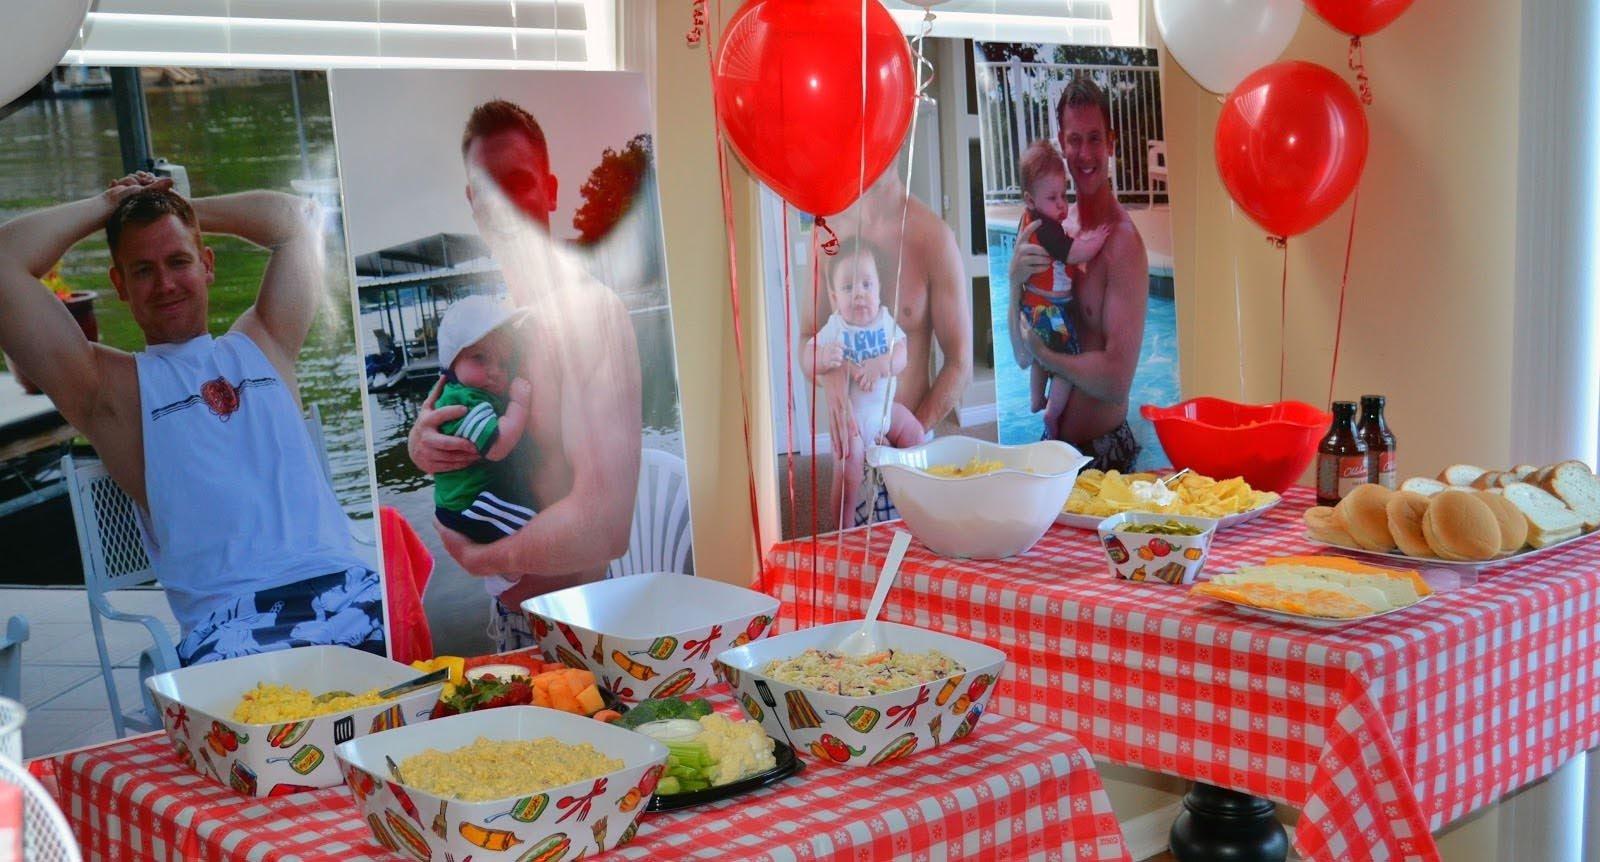 10 Spectacular Ideas For A Surprise Birthday Party surprise birthday party ideas for him home party ideas 2 2020